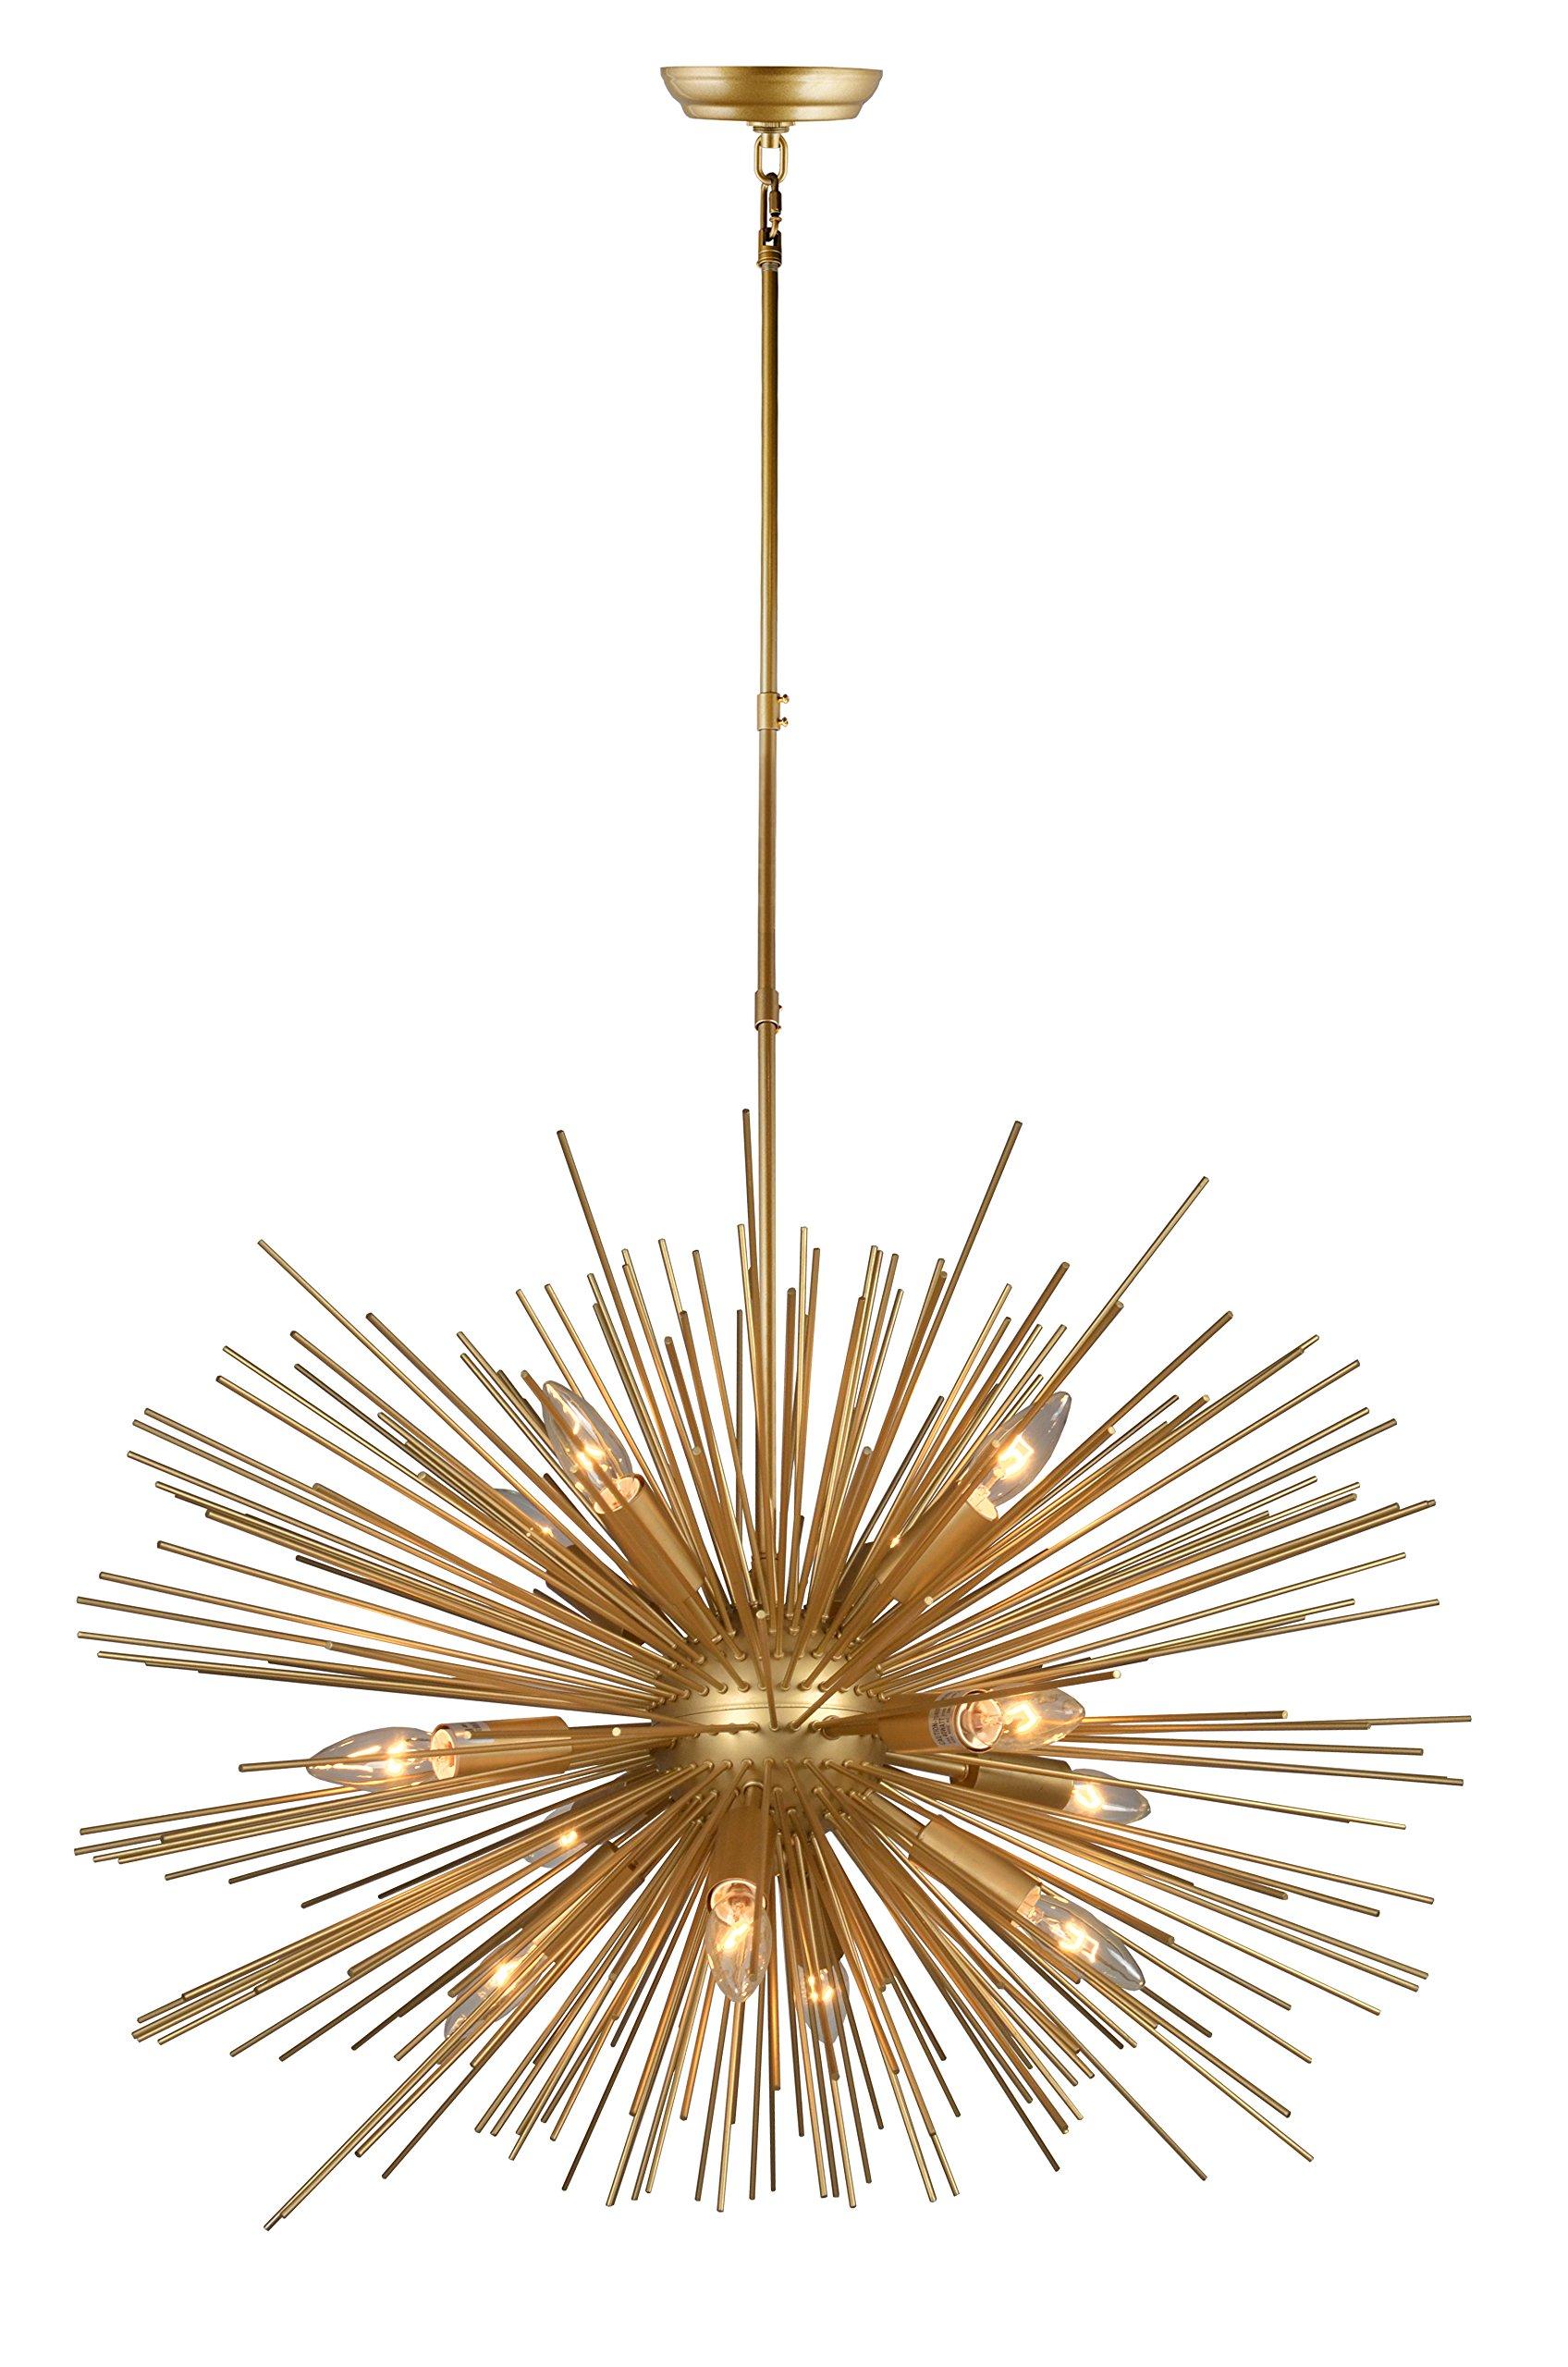 Decomust 30 Inch Astra Sputnik Light Satellite Pendant Light Sputnik Chandelier Gold Ceiling Light Fixture Rod